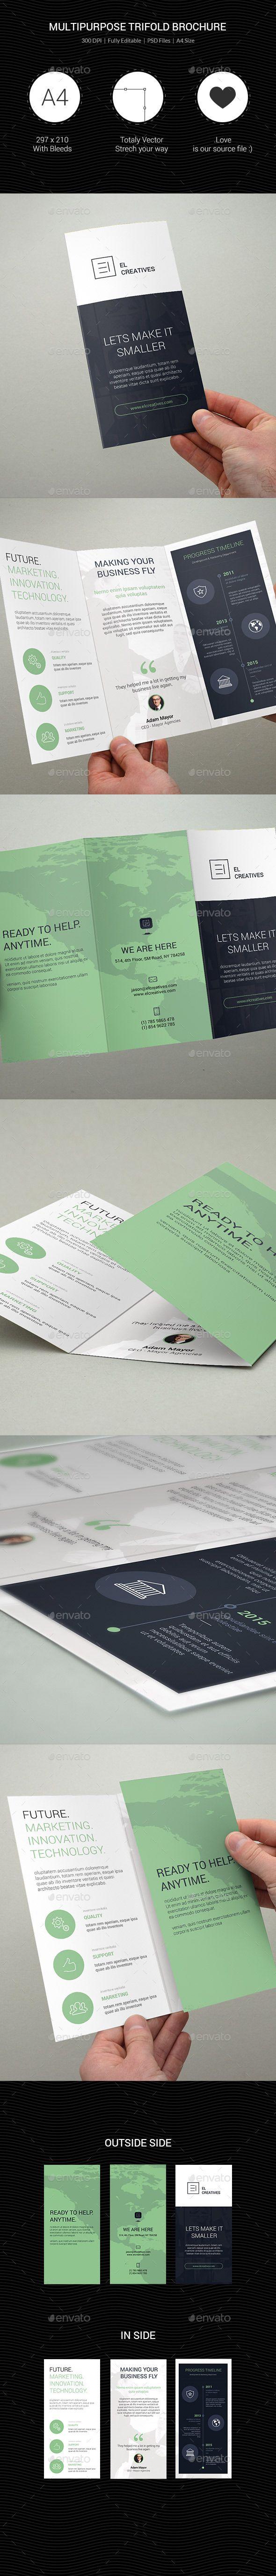 Multipurpose Creative Trifold Brochure - 07